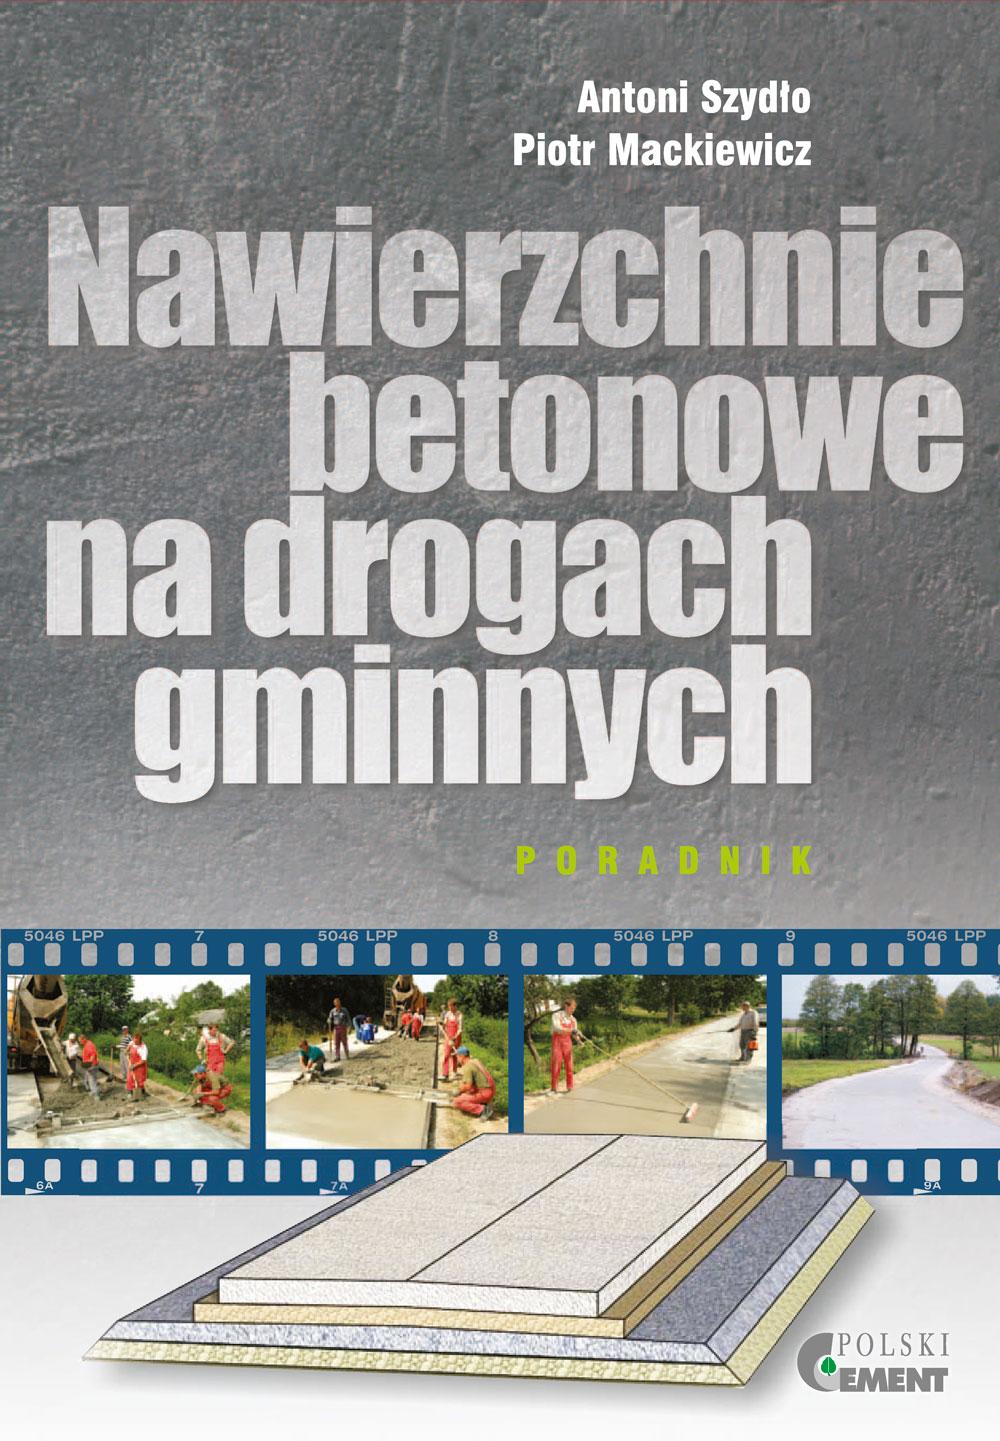 https://www.betonowedrogi.com/wp-content/uploads/2020/07/poradnik-old_Strona_01.jpg